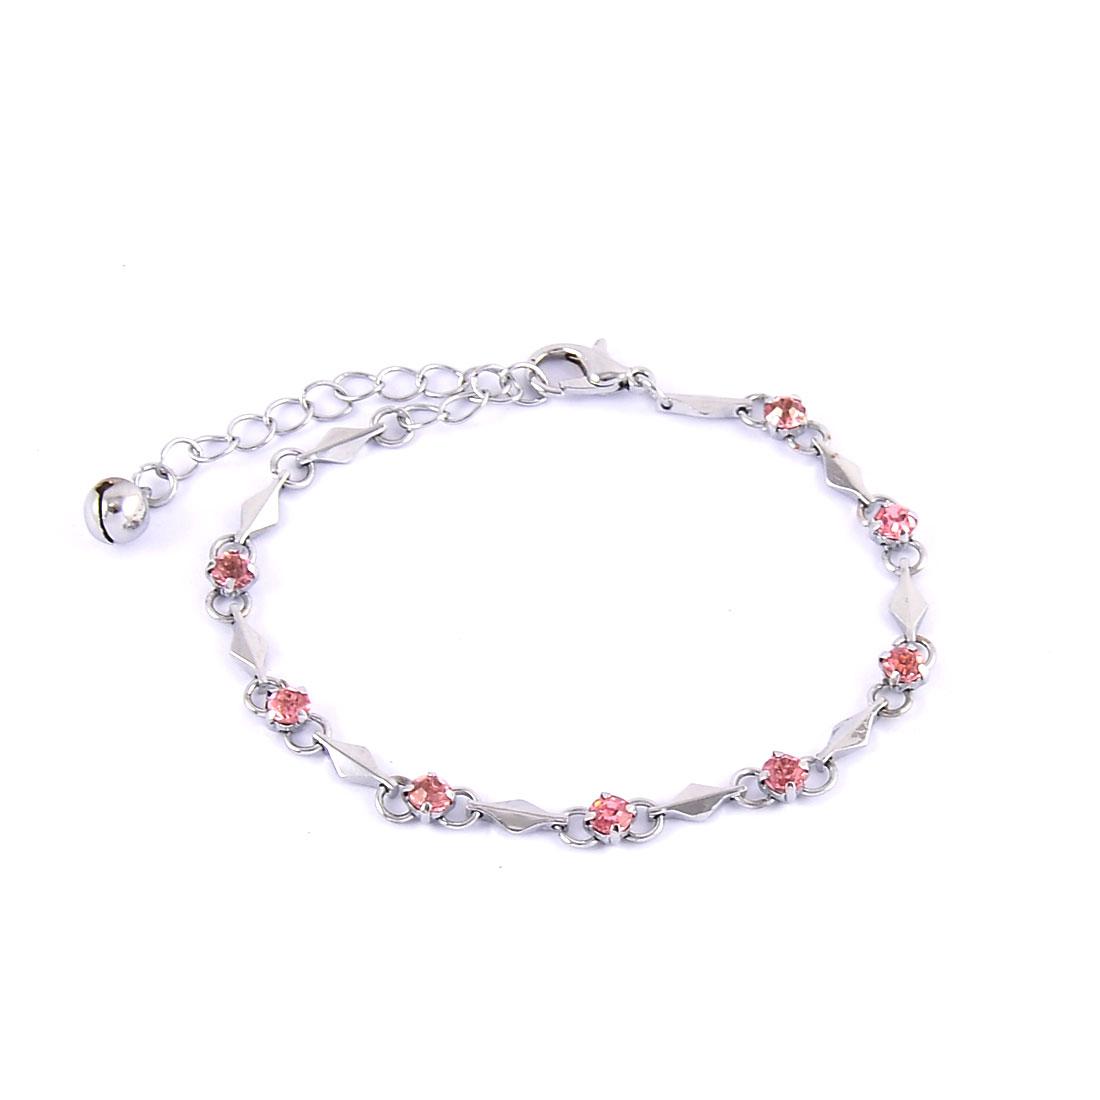 Ladies Metal Manmade Crystal Decoration Wrist Chain Bangle Bracelet